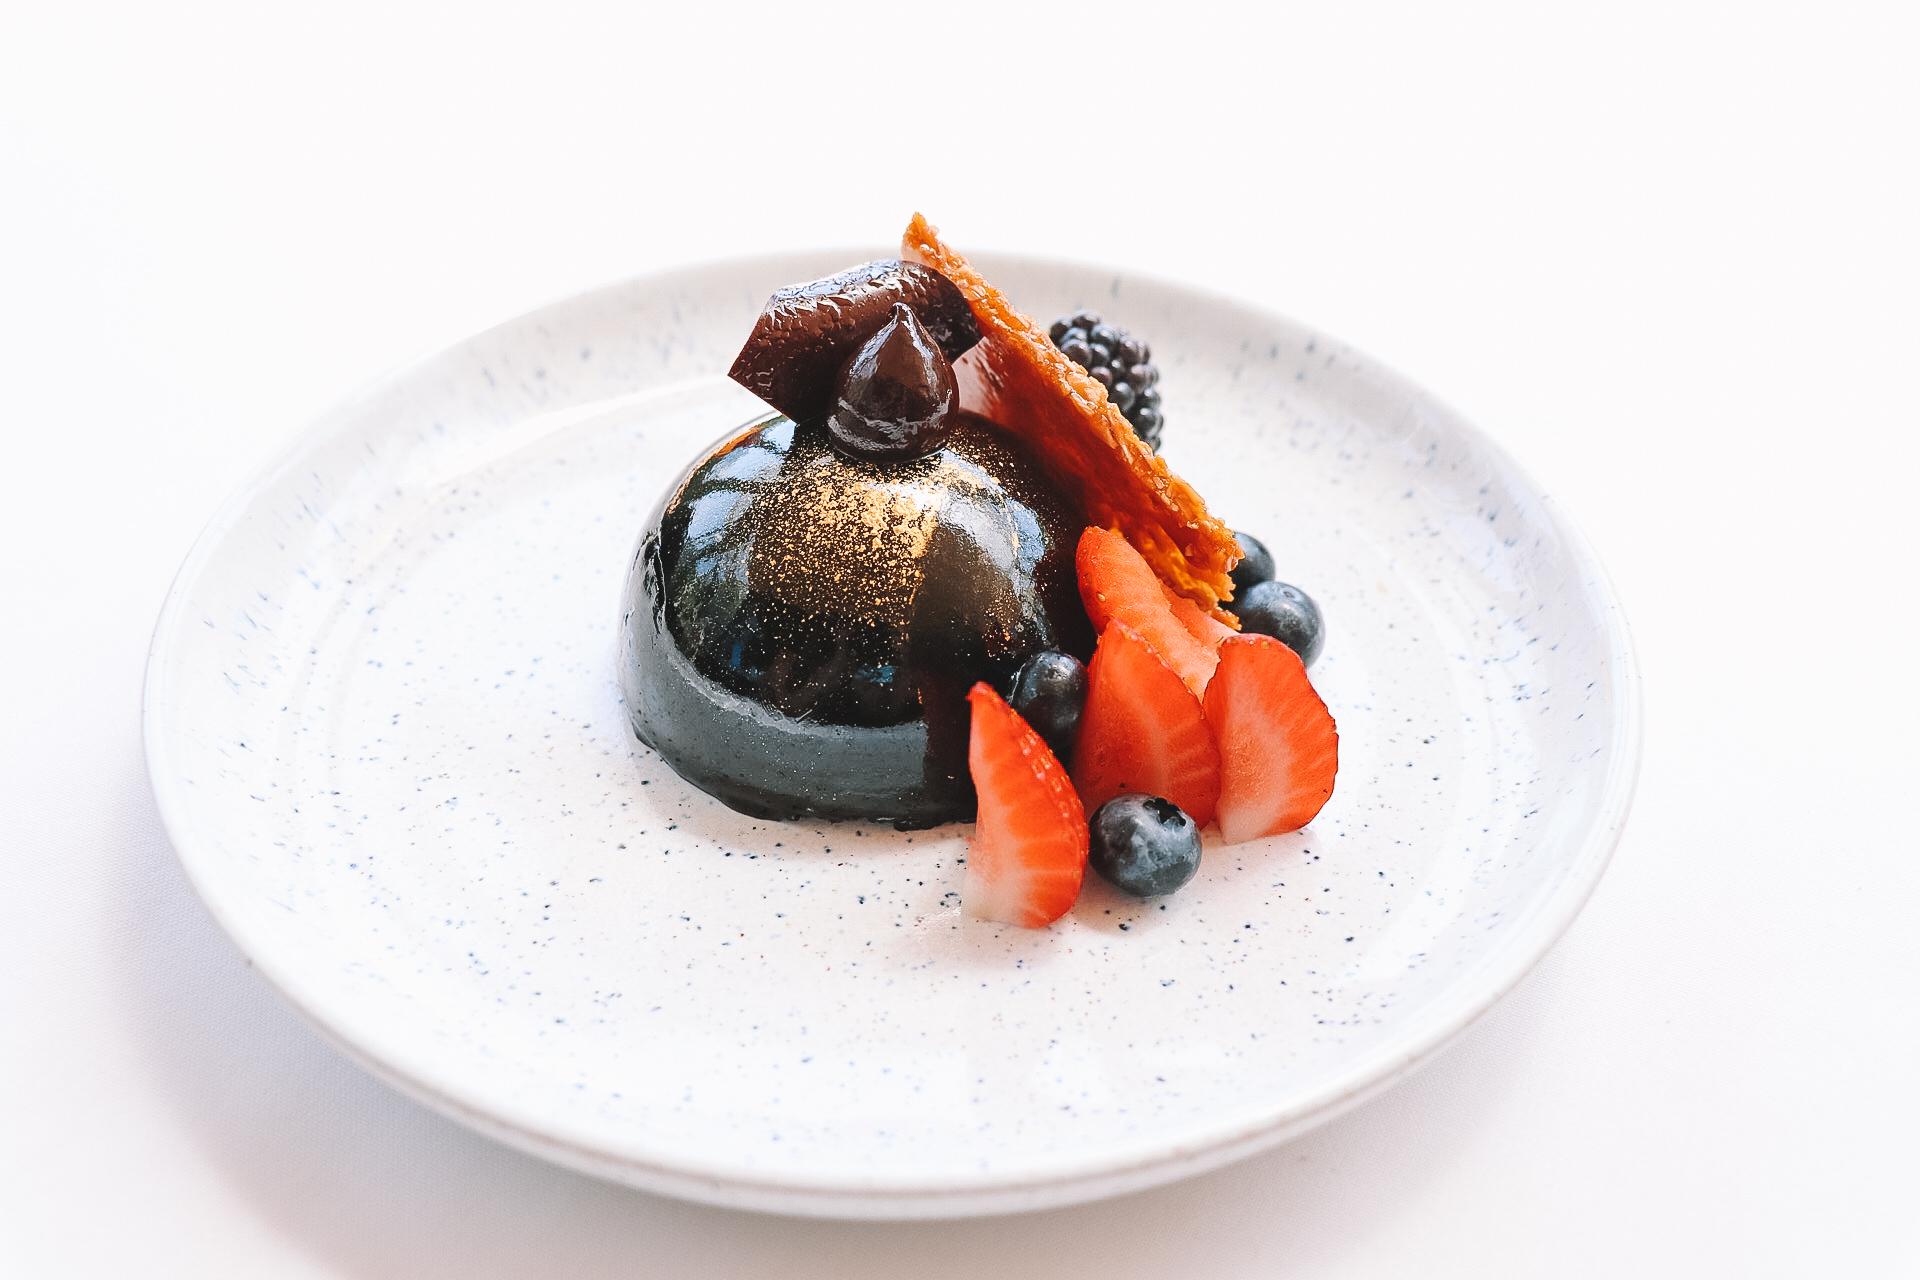 Chocolate dome dessert